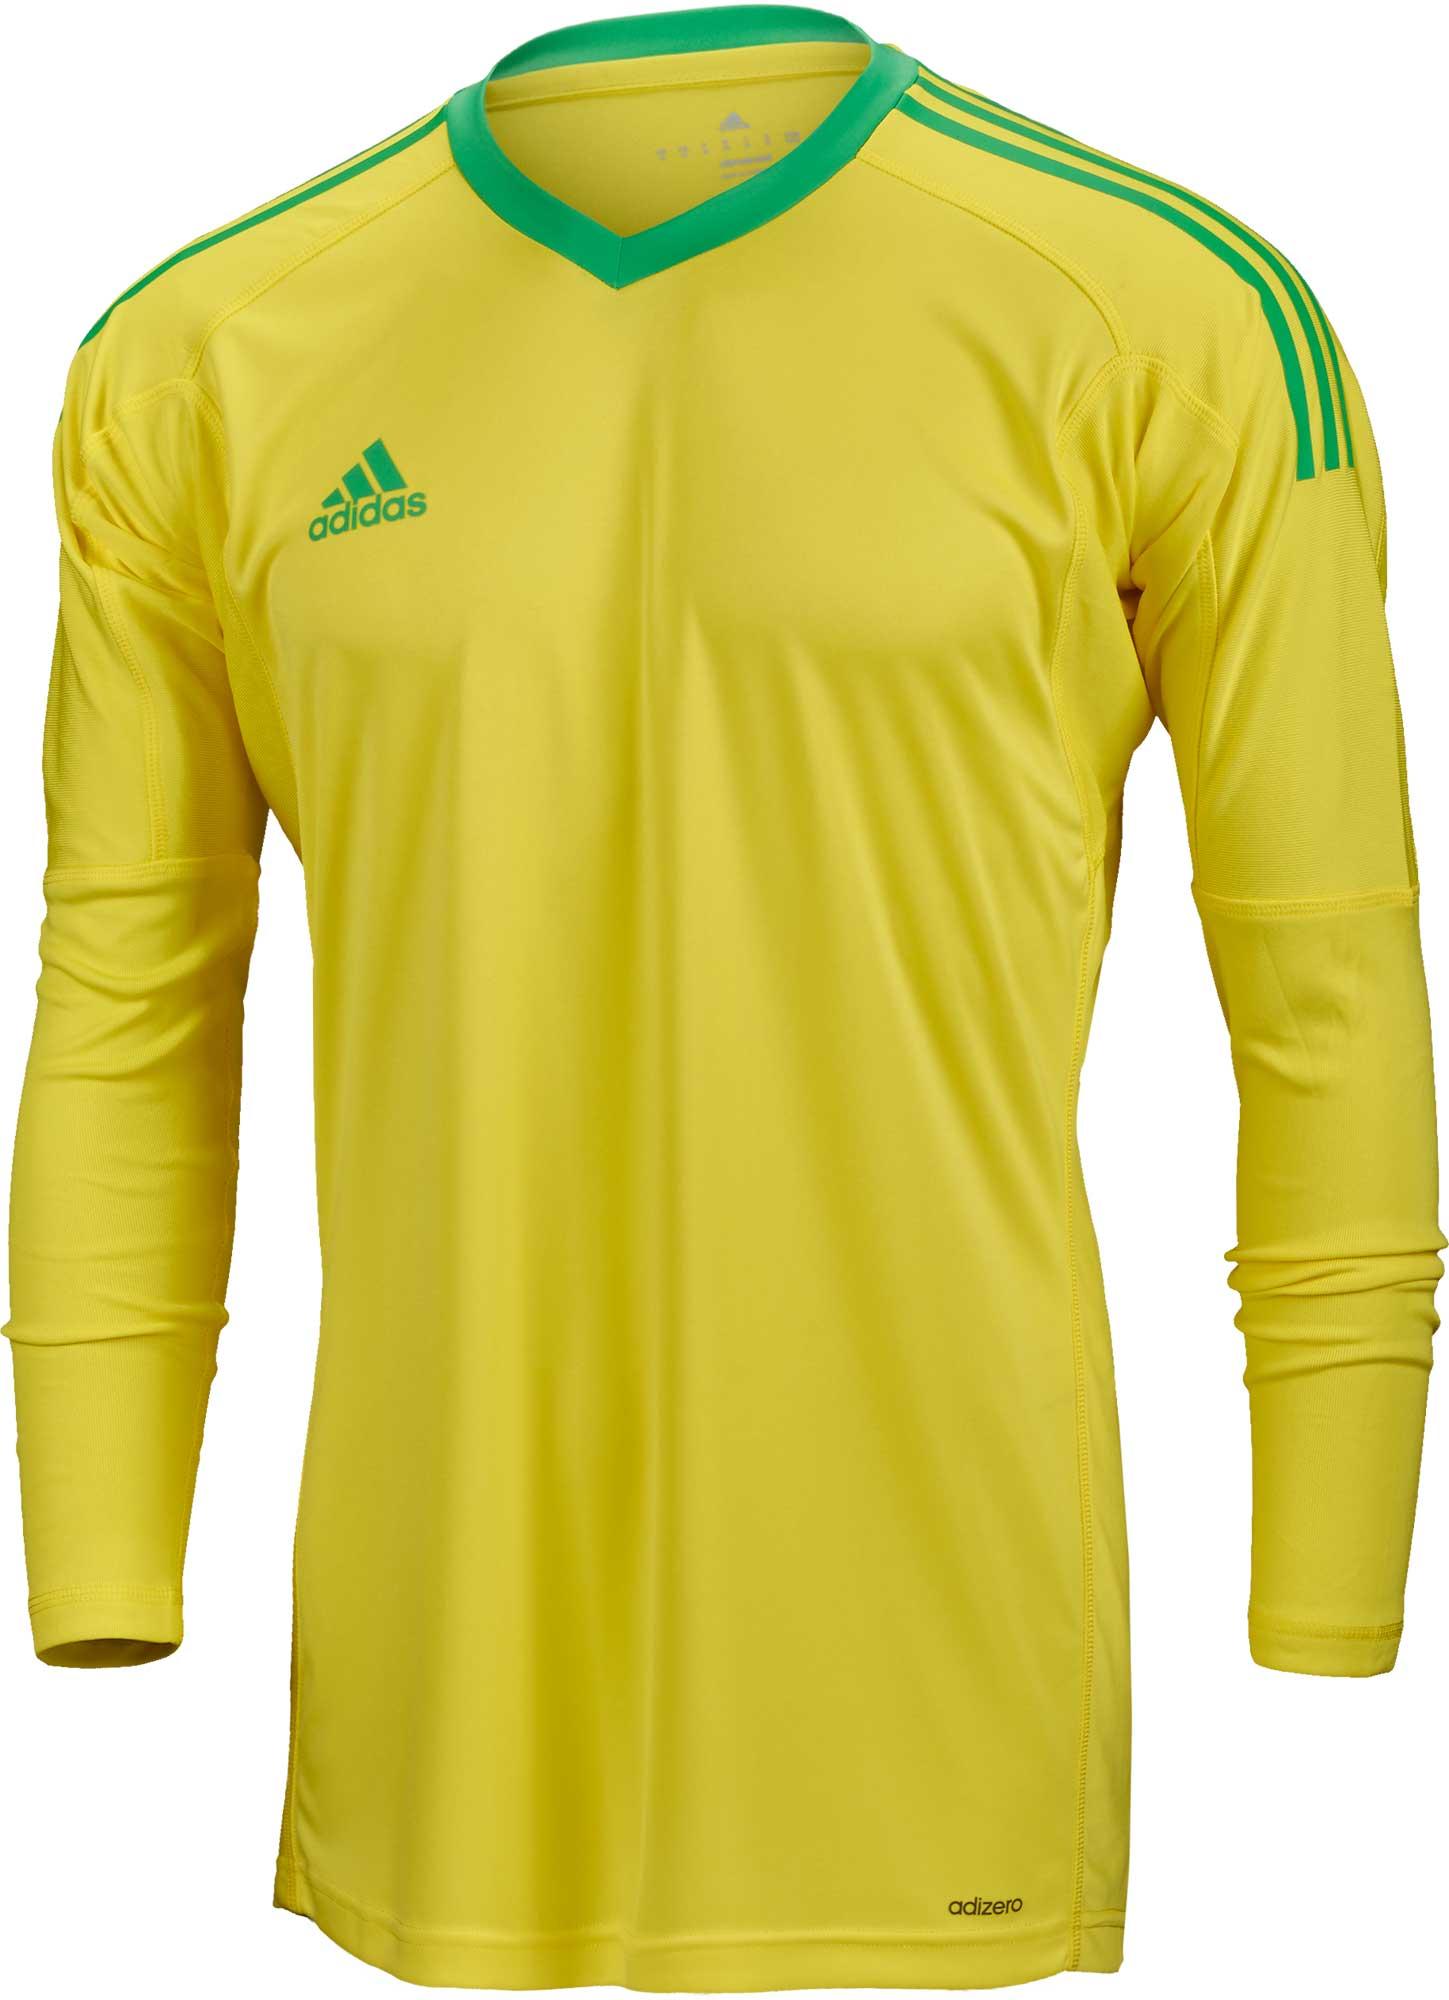 adidas Revigo 17 Goalkeeper Jersey - Bright Yellow & Energy Green